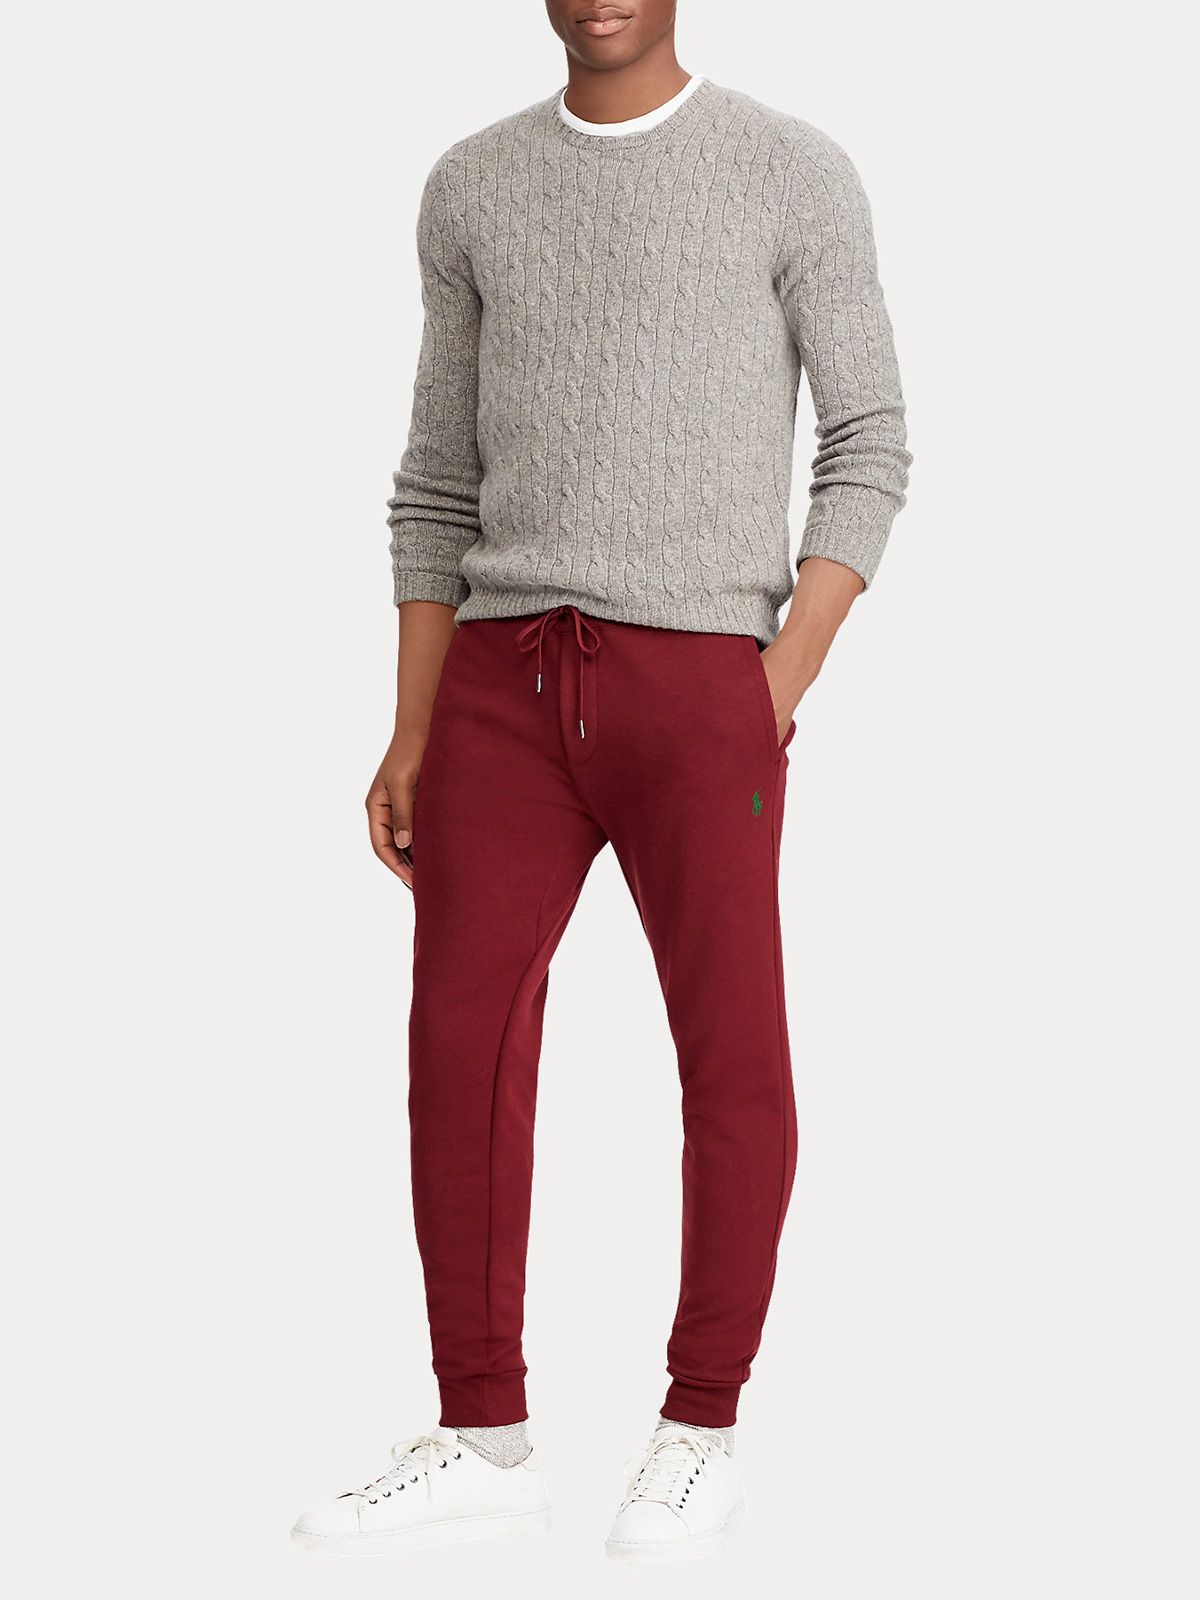 Immagine di Polo Ralph Lauren | Trousers Jogger Pant